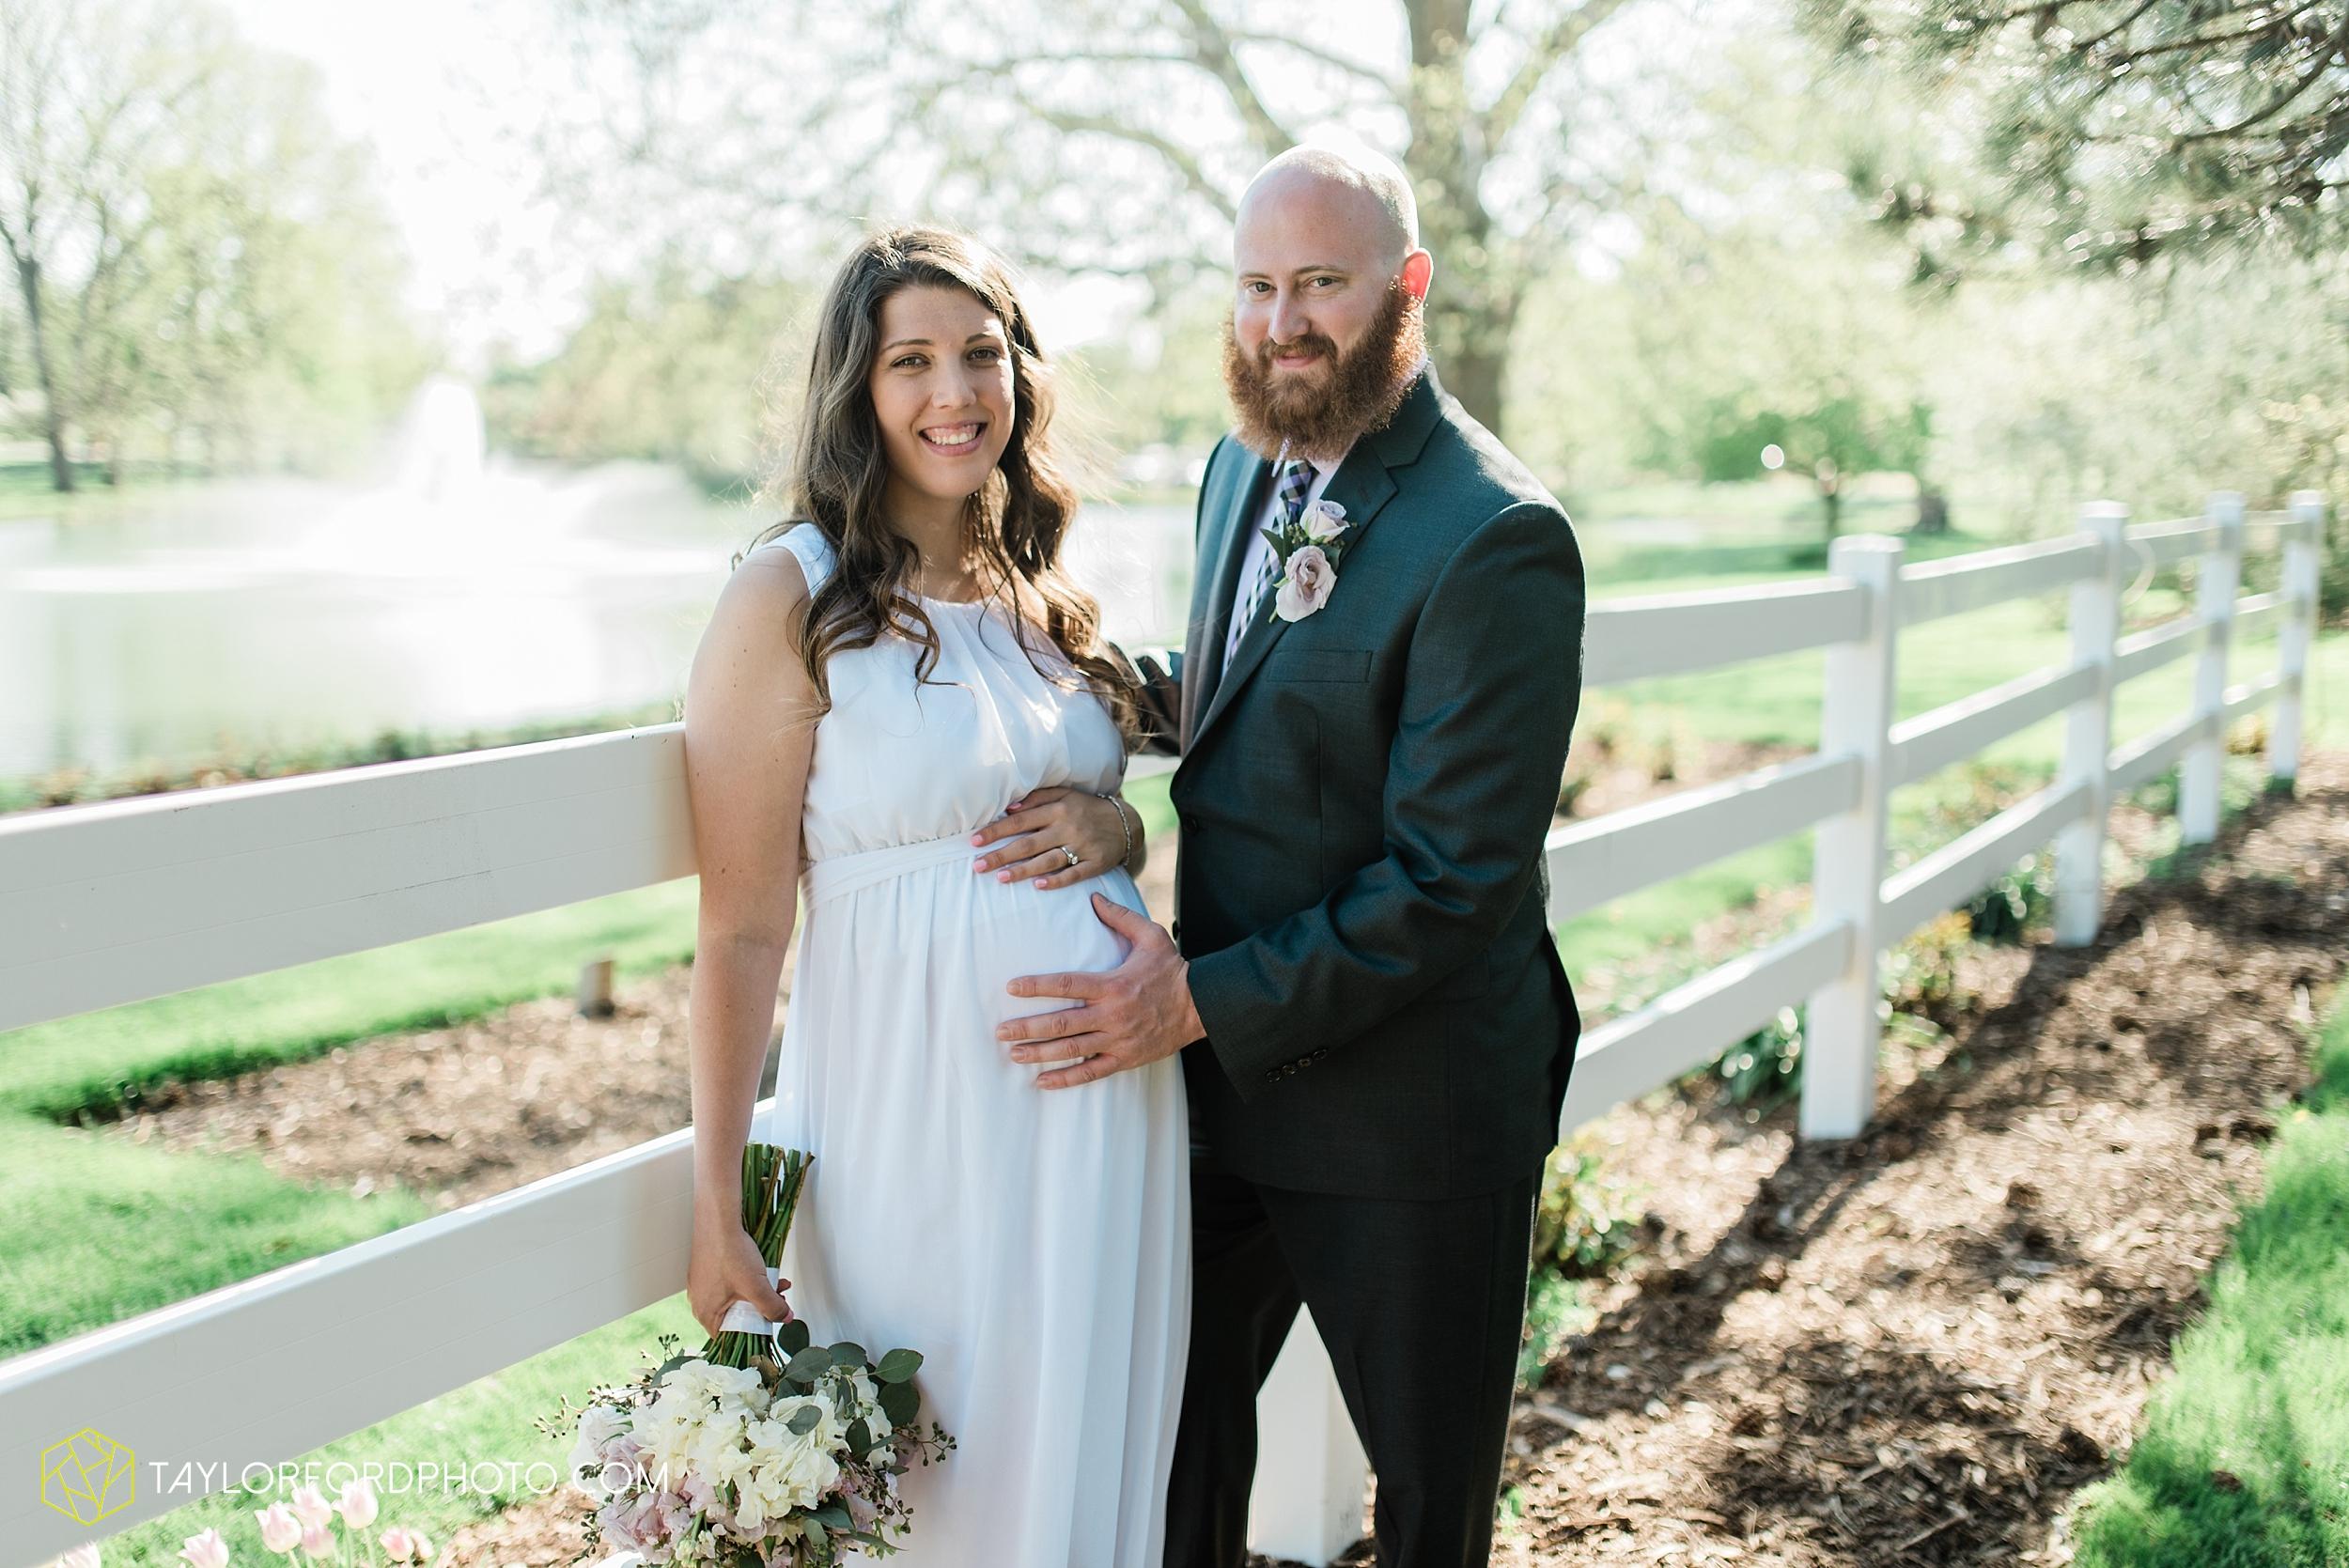 lakeside-rose-gardens-fort-wayne-indiana-elopement-wedding-photographer-Taylor-Ford-Photography_7179.jpg